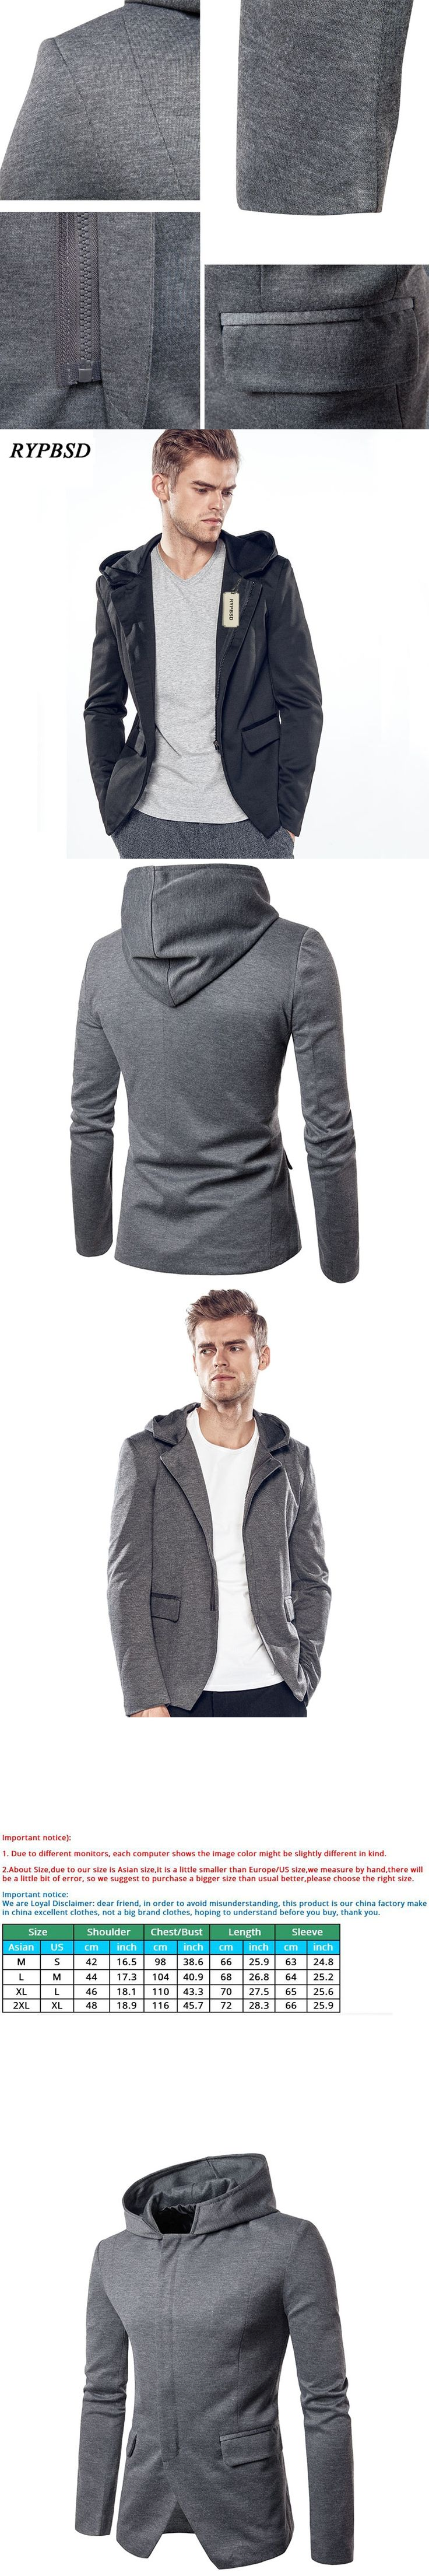 Autumn New British Blazer Men 2017 Solid Black Gray Zipper Design Casual Long Sleeve Hooded Suit Blazer Jacket and Coat Men 2XL